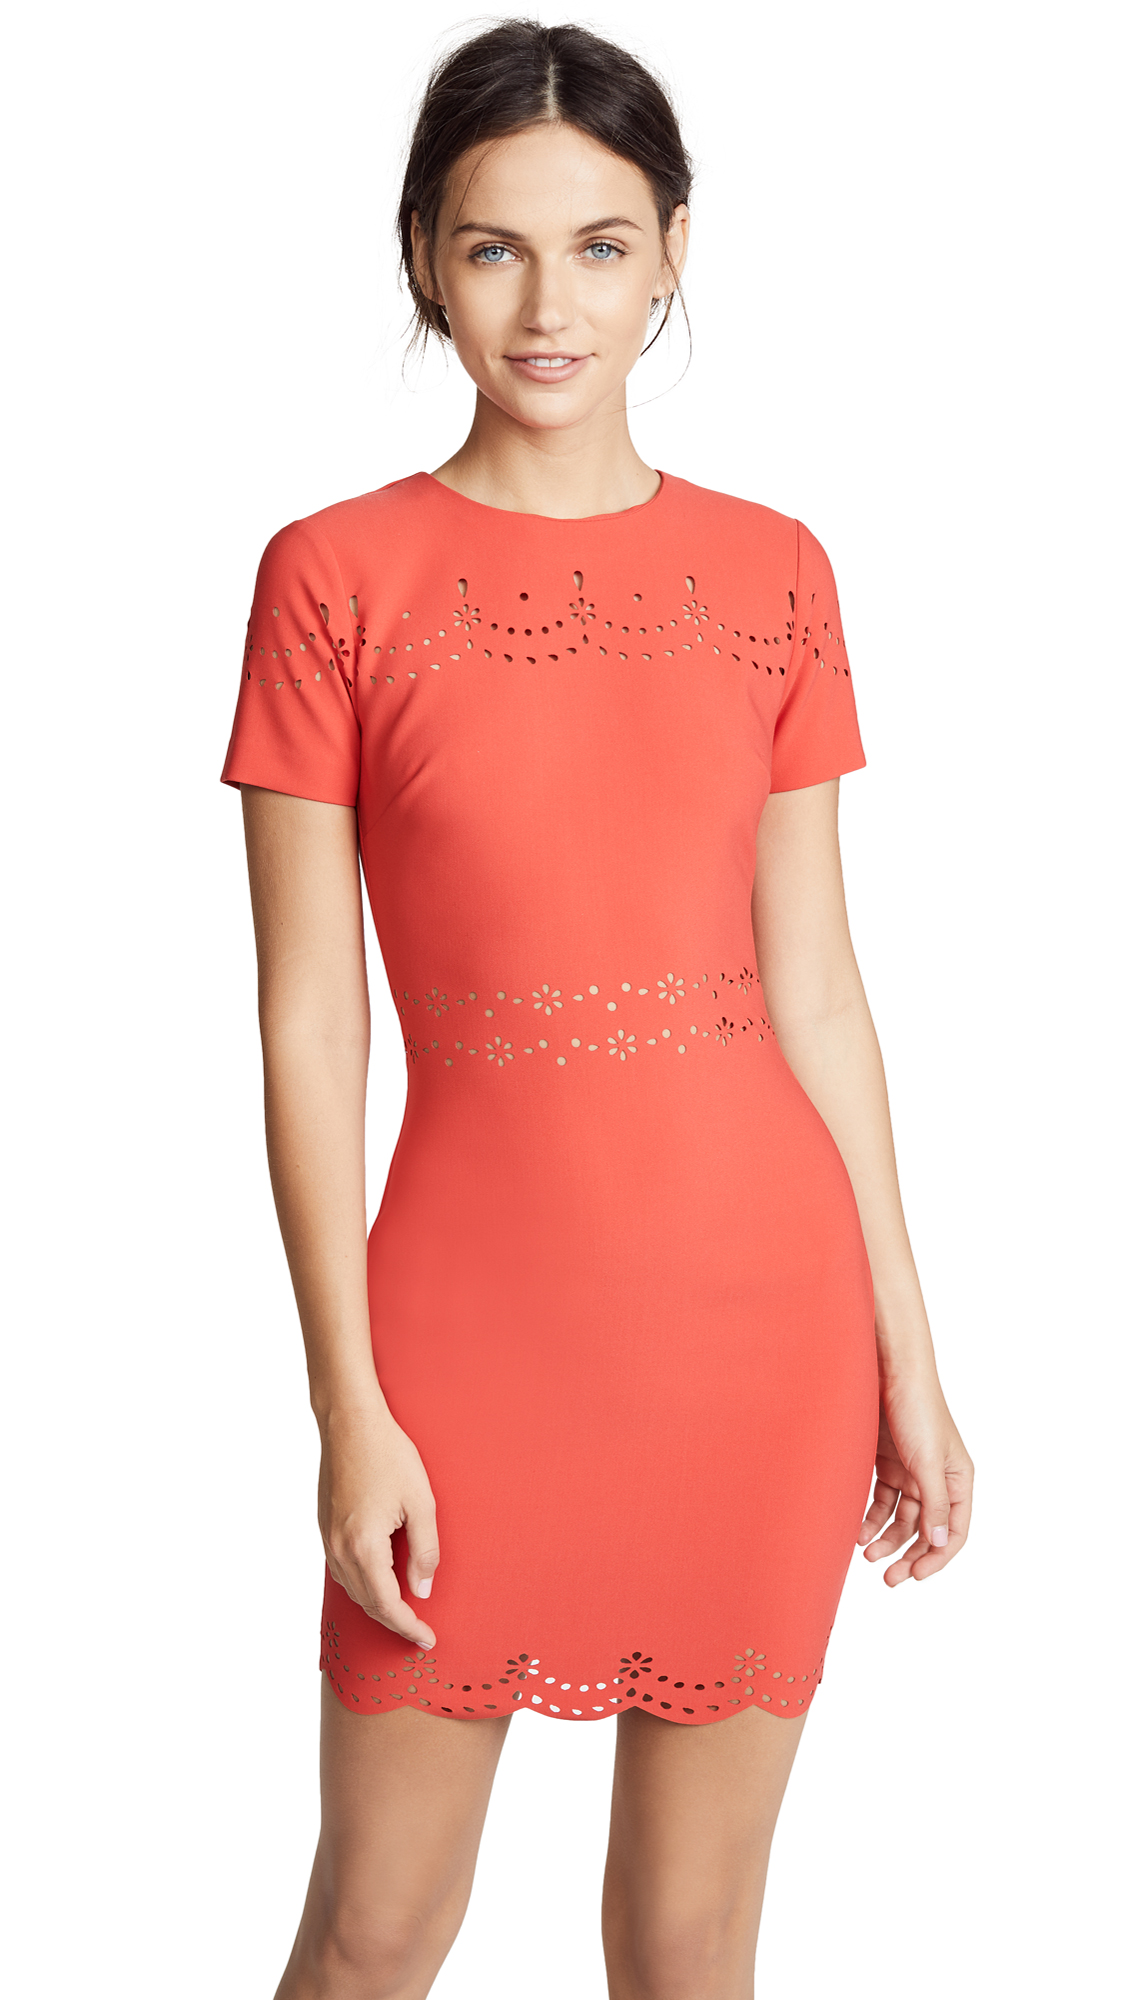 LIKELY Eyelet Manhattan Dress